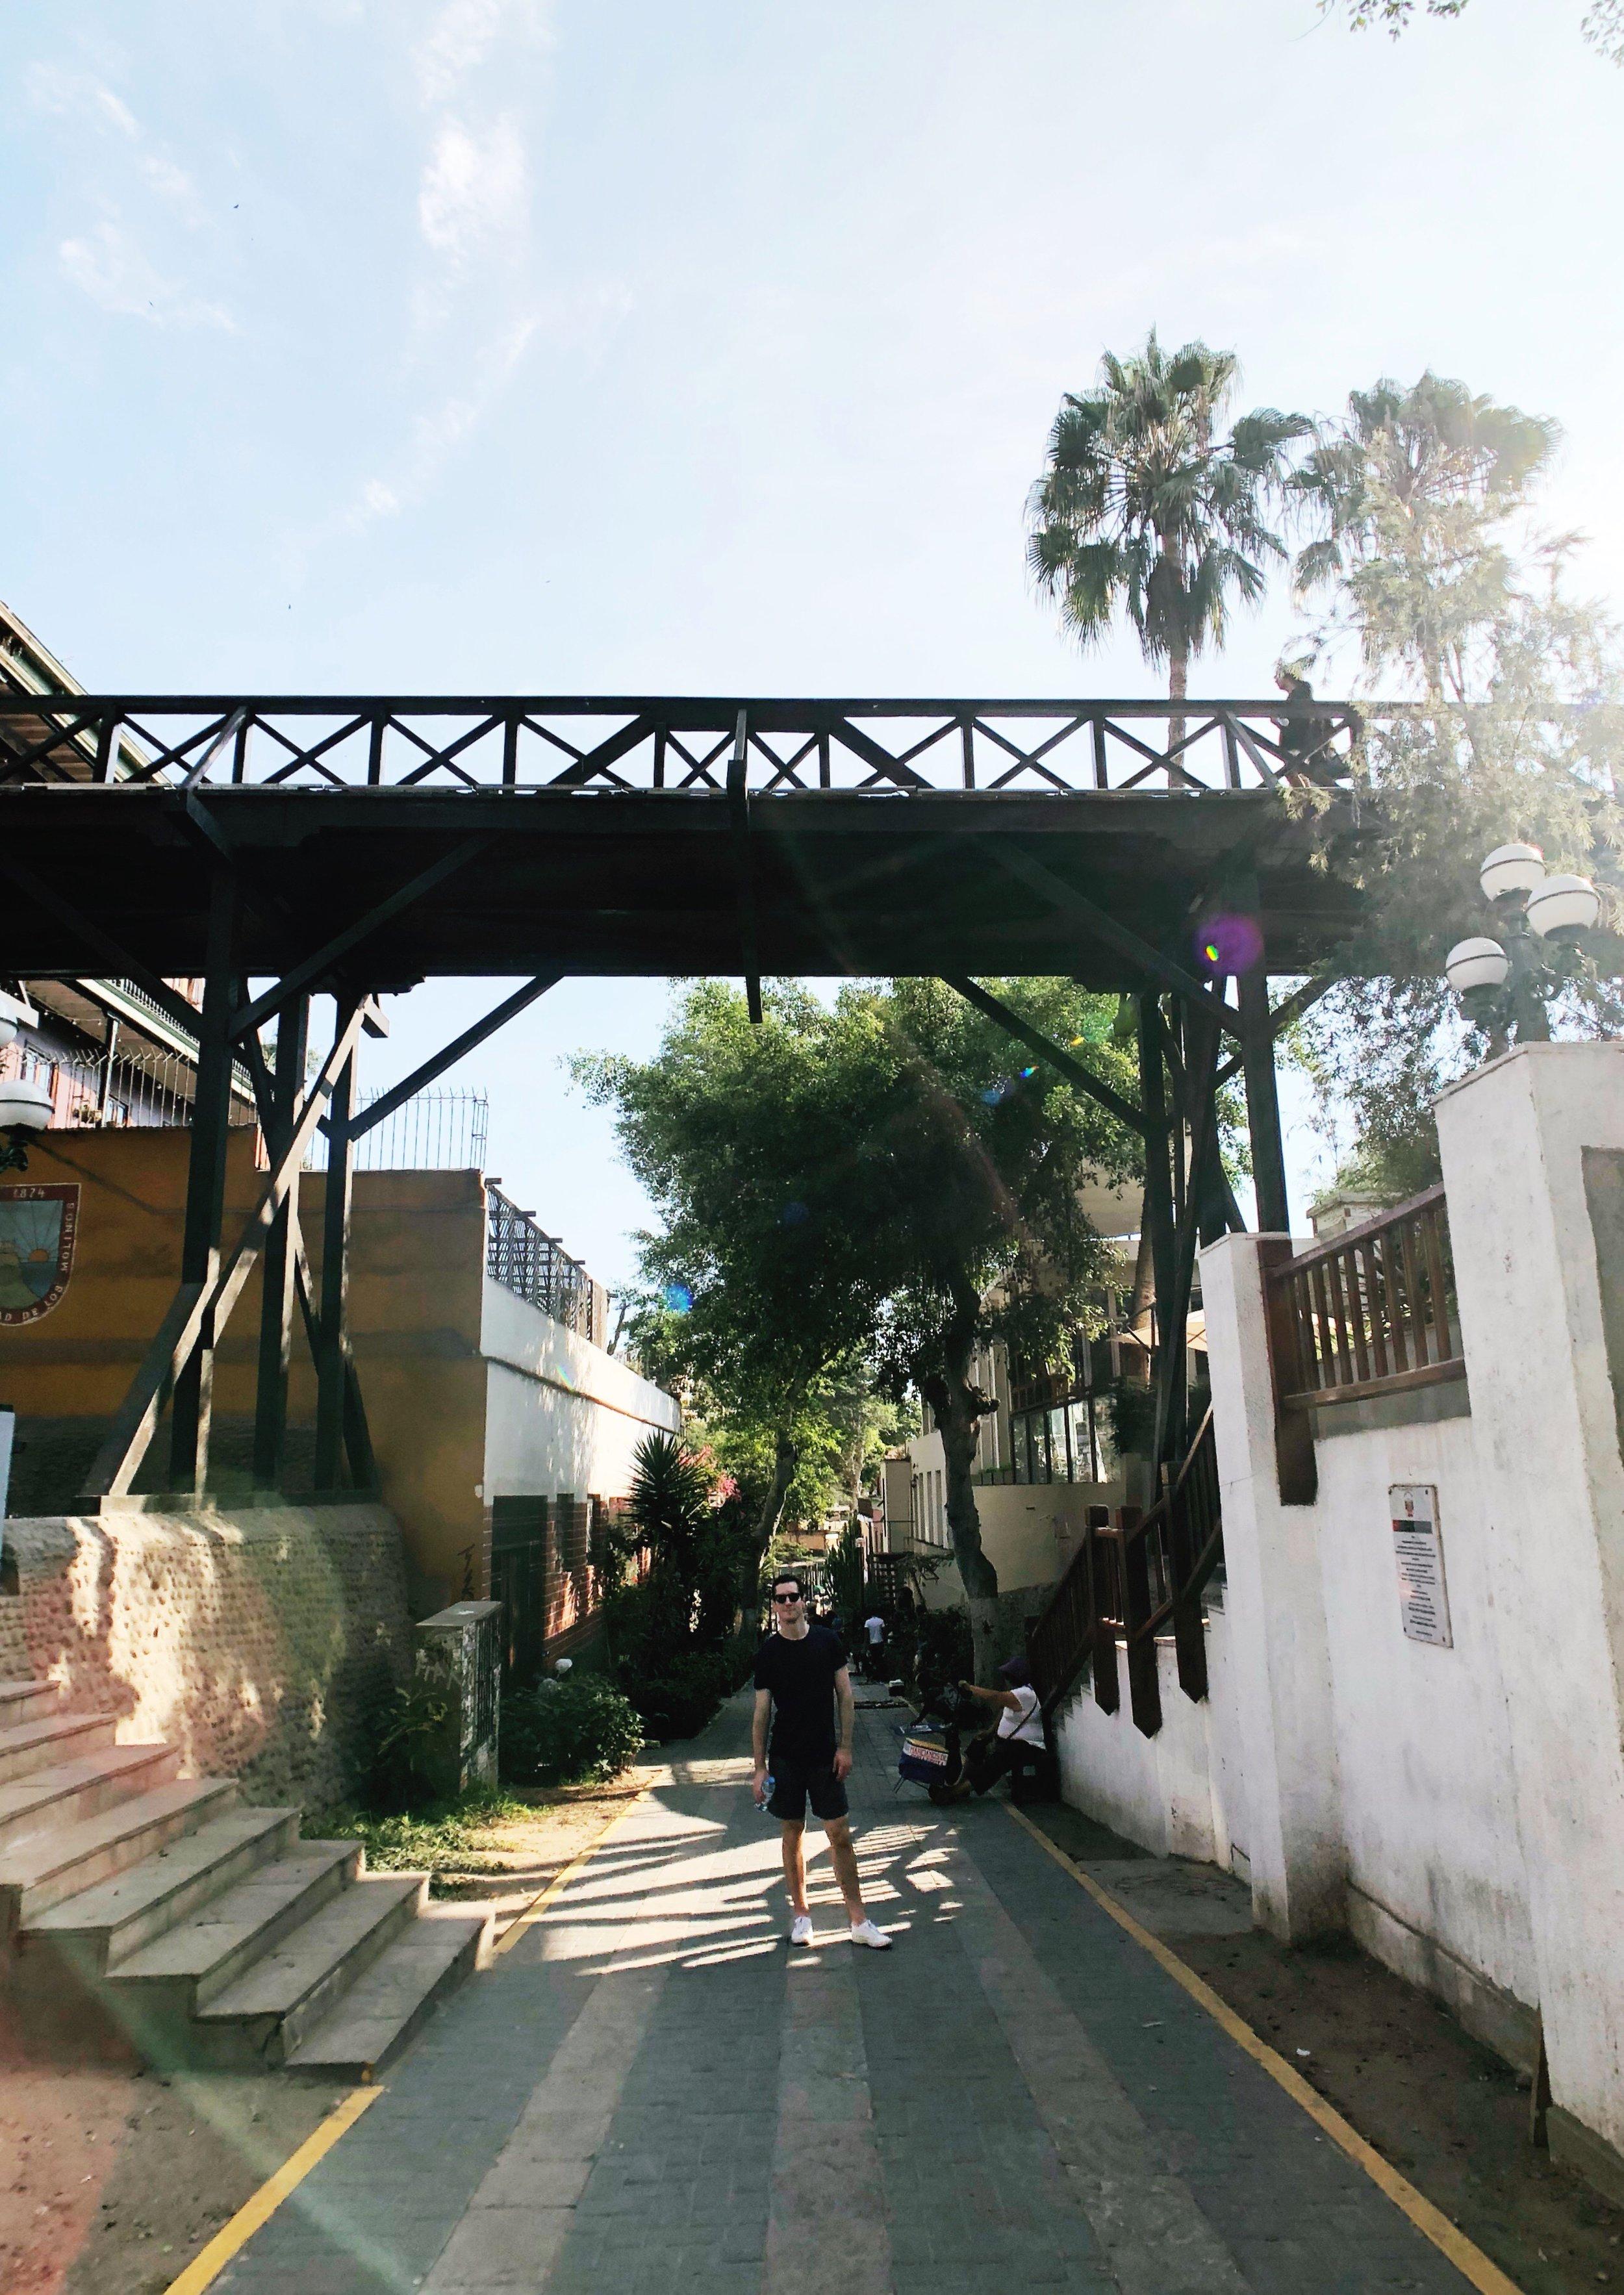 Bridge-of-sighs-barranco-lima-peru-travel-tips